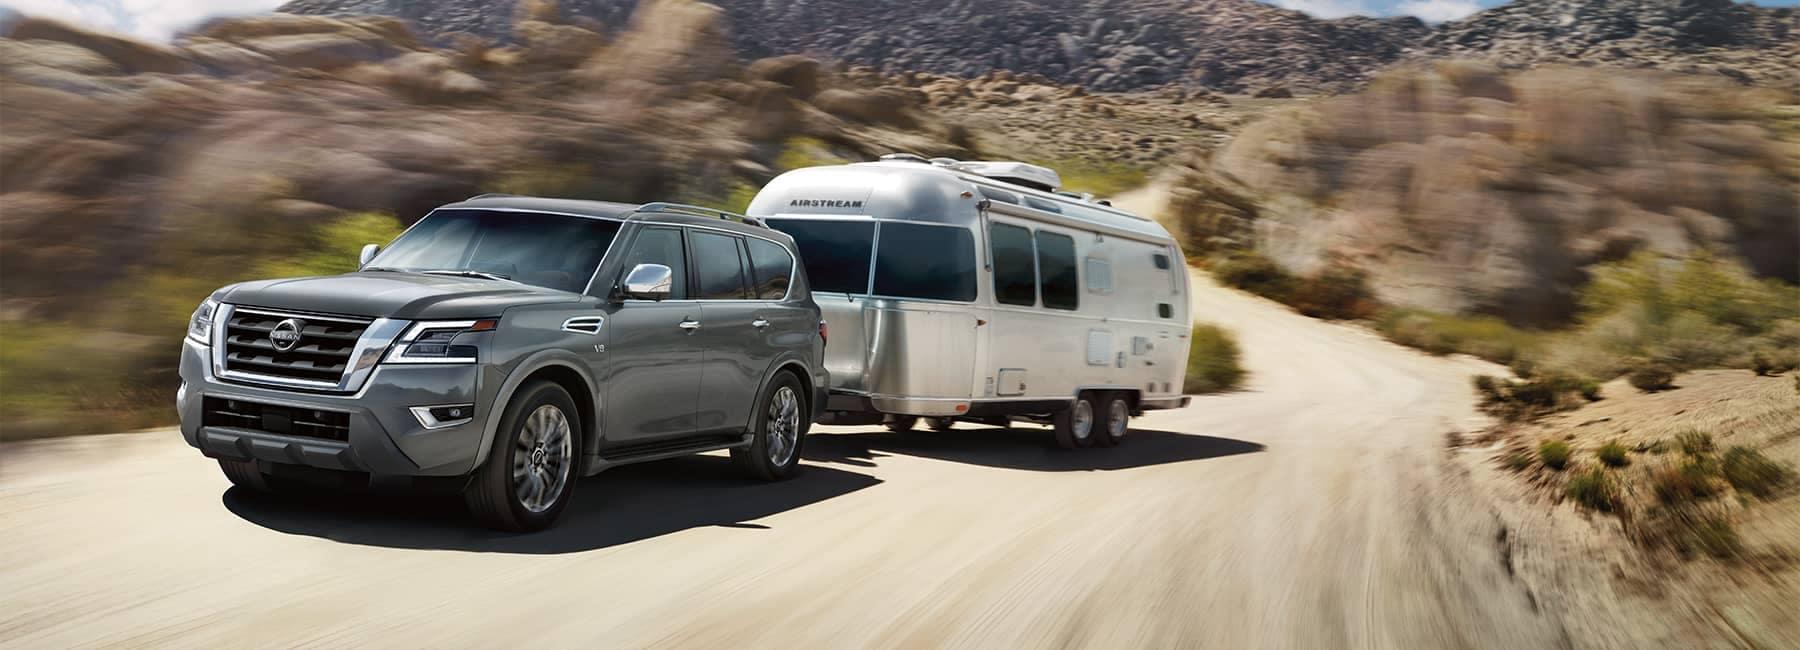 A 2021 Grey Nissan Armada hauling an Airstreem camper